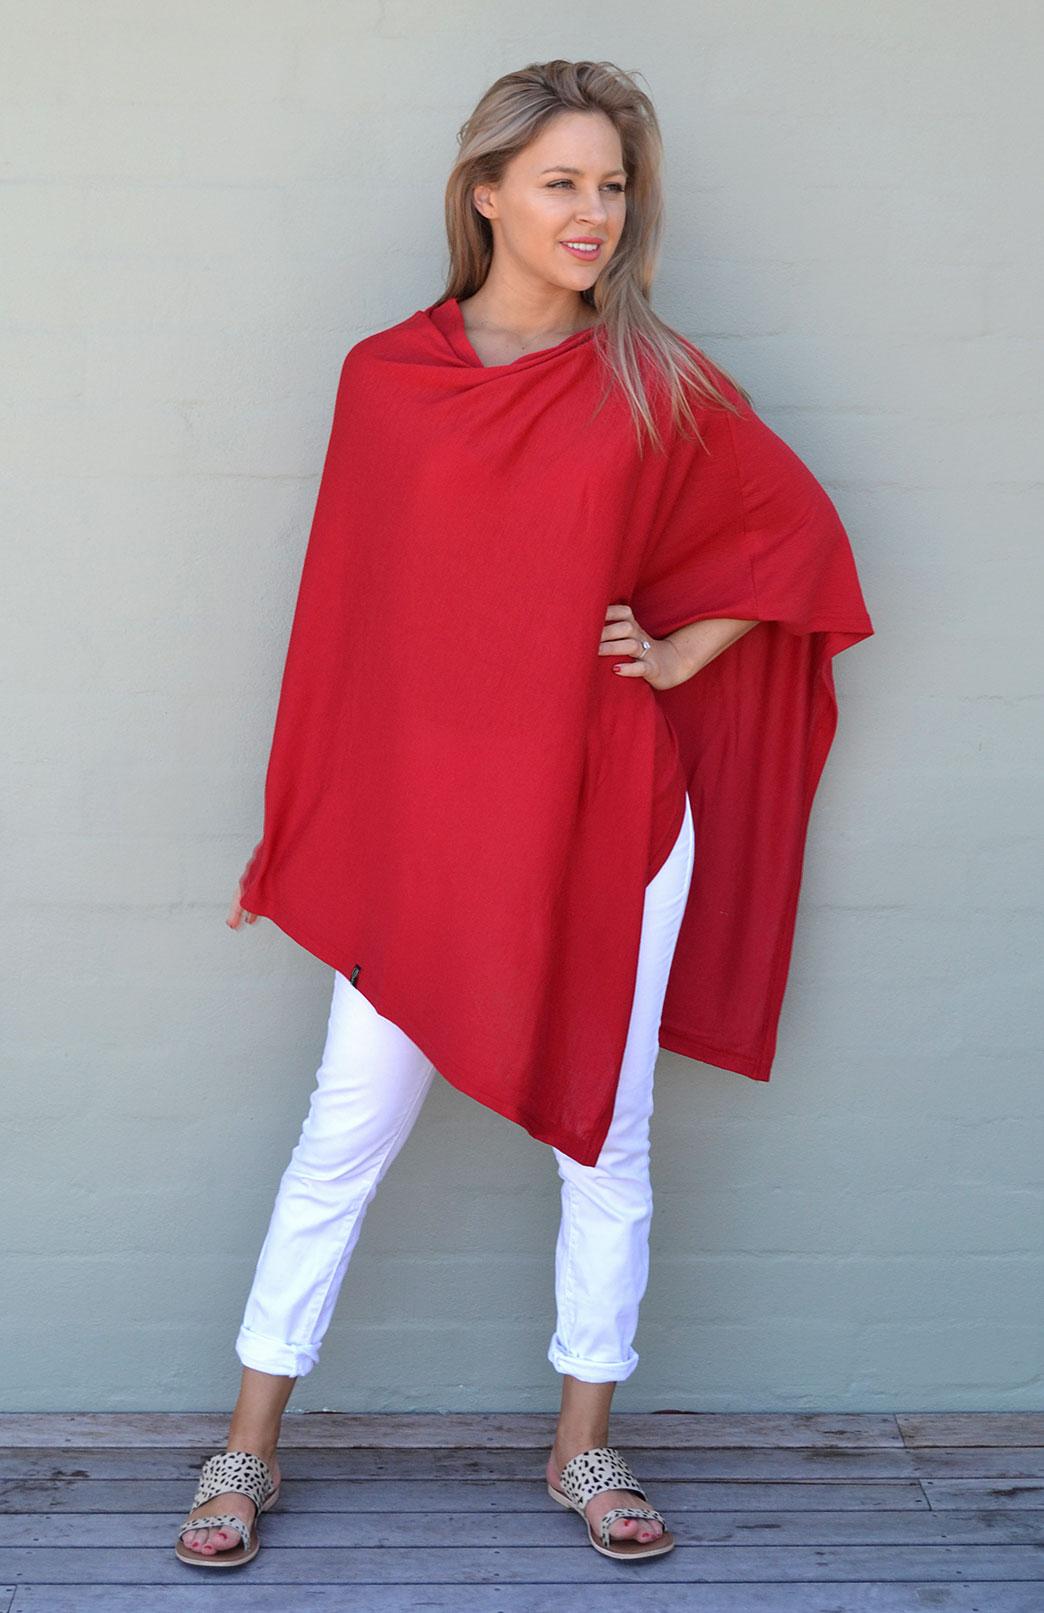 Oversized Wool Poncho - Plain - Women's Oversized Red Wool Poncho - Smitten Merino Tasmania Australia